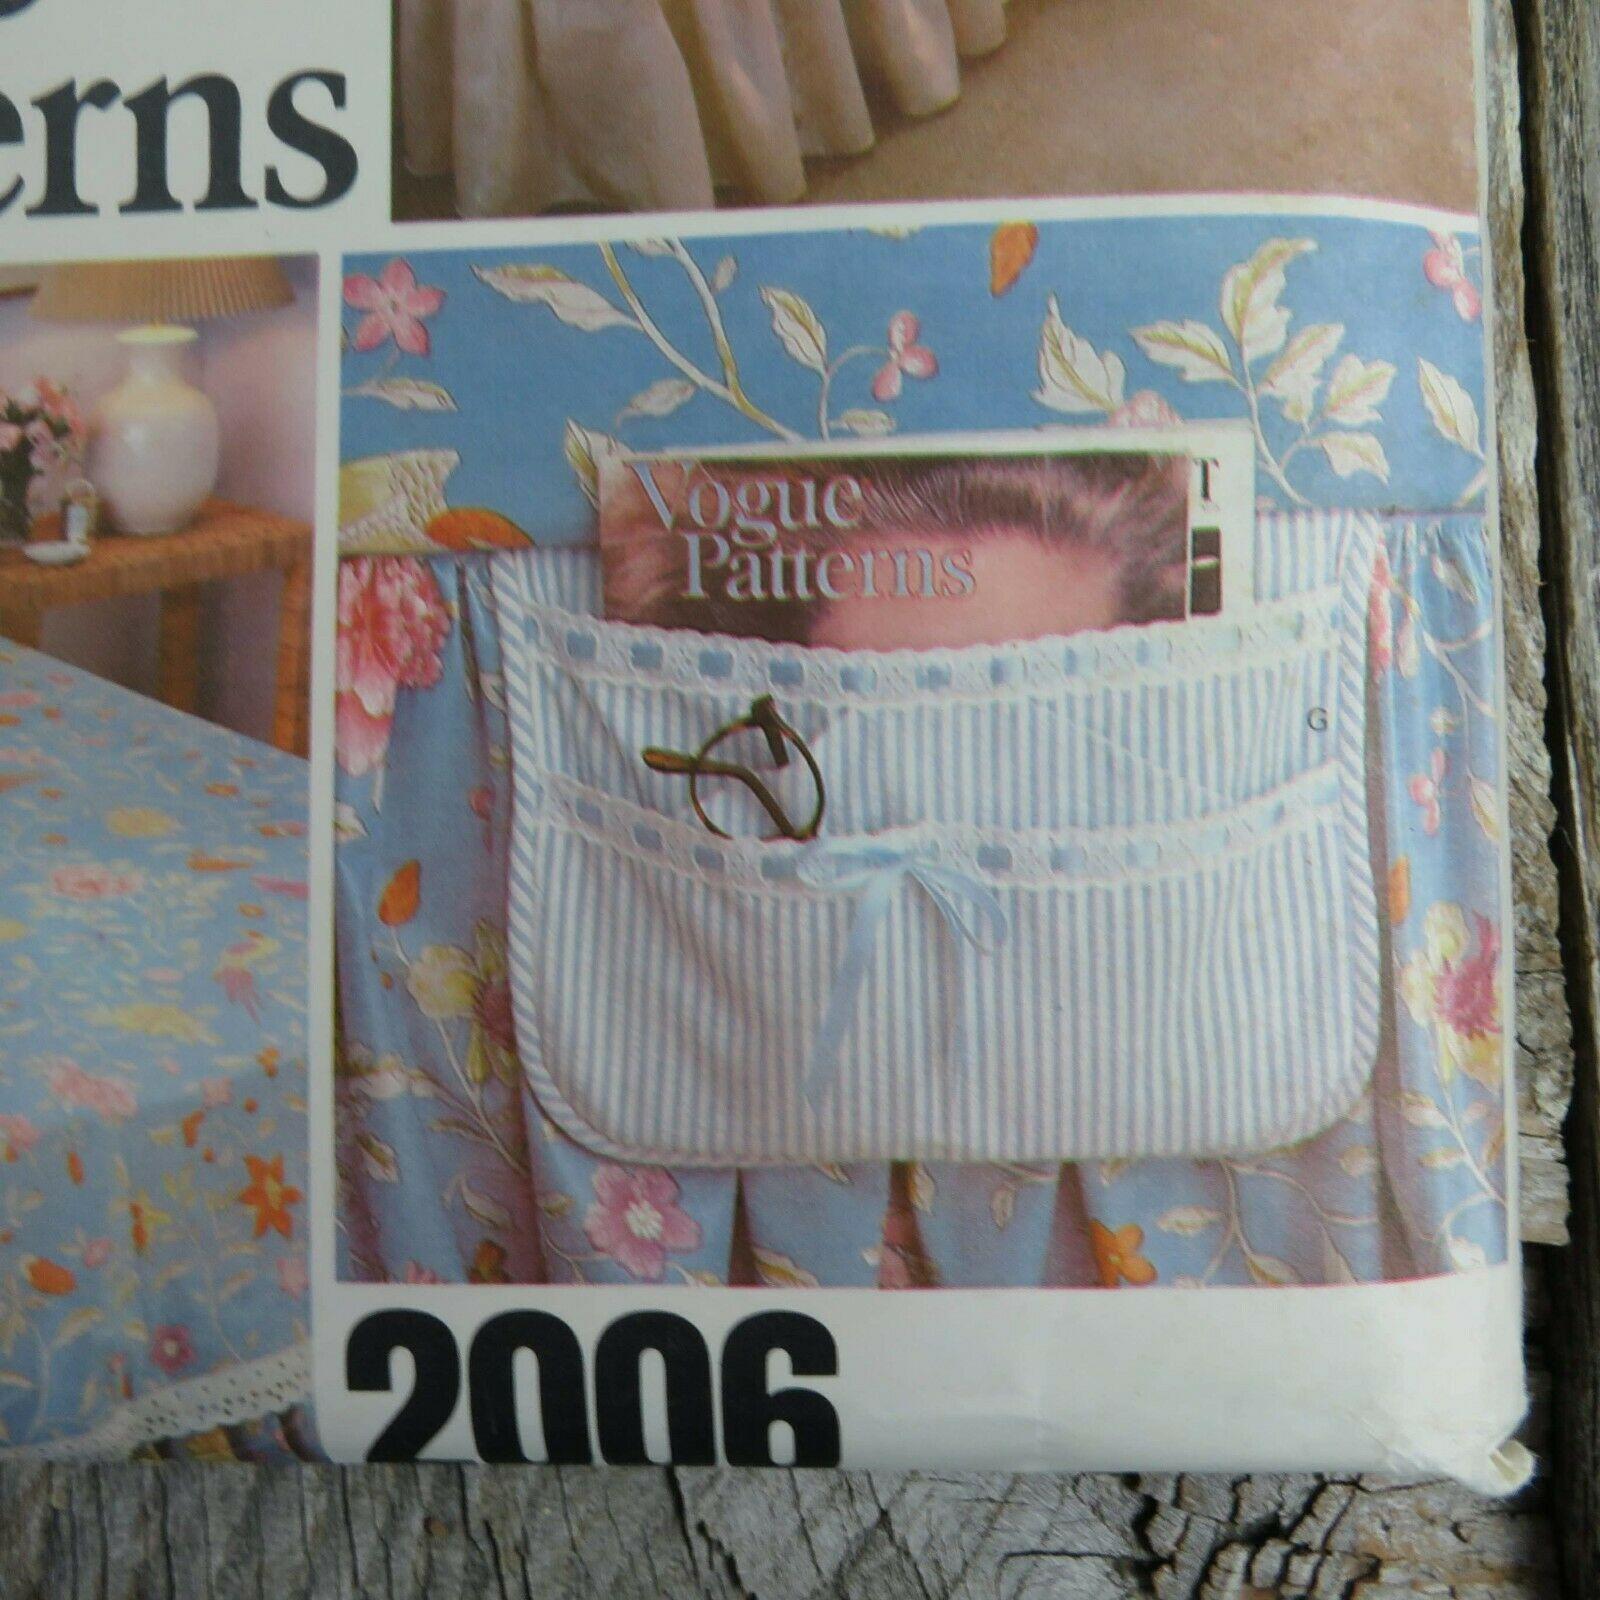 Vintage Vogue Bedspread Linen Sewing Pattern Bedroom Sham Pillow Bed Covers image 6